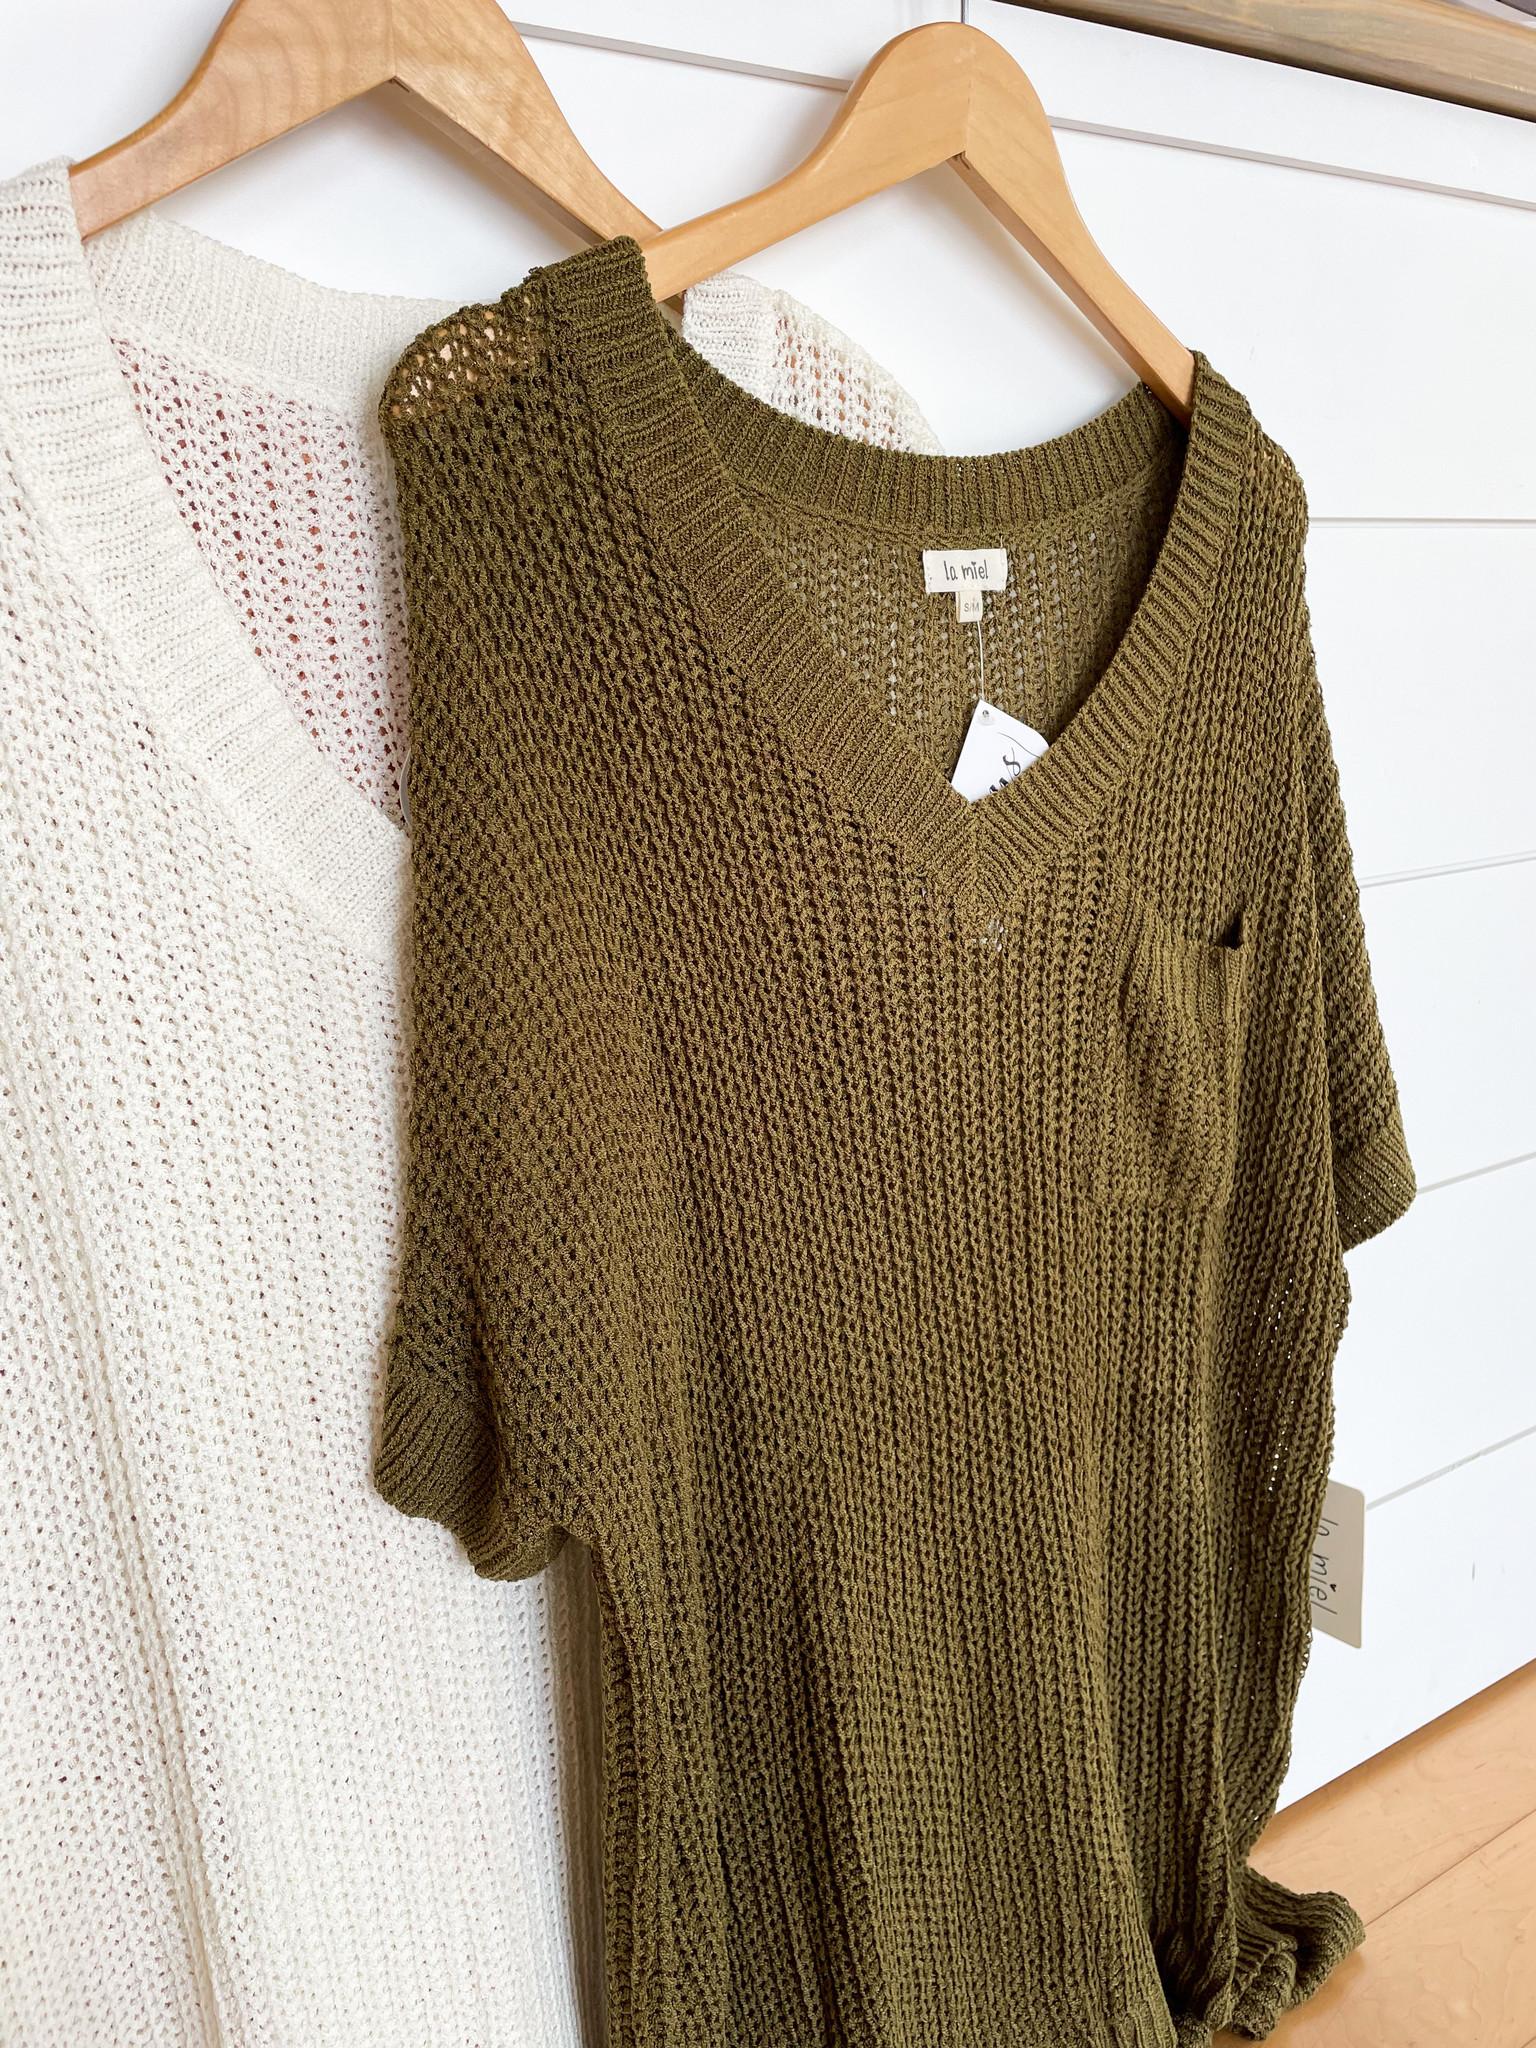 V-Neckline Slouchy Short Sleeve Sweater Top